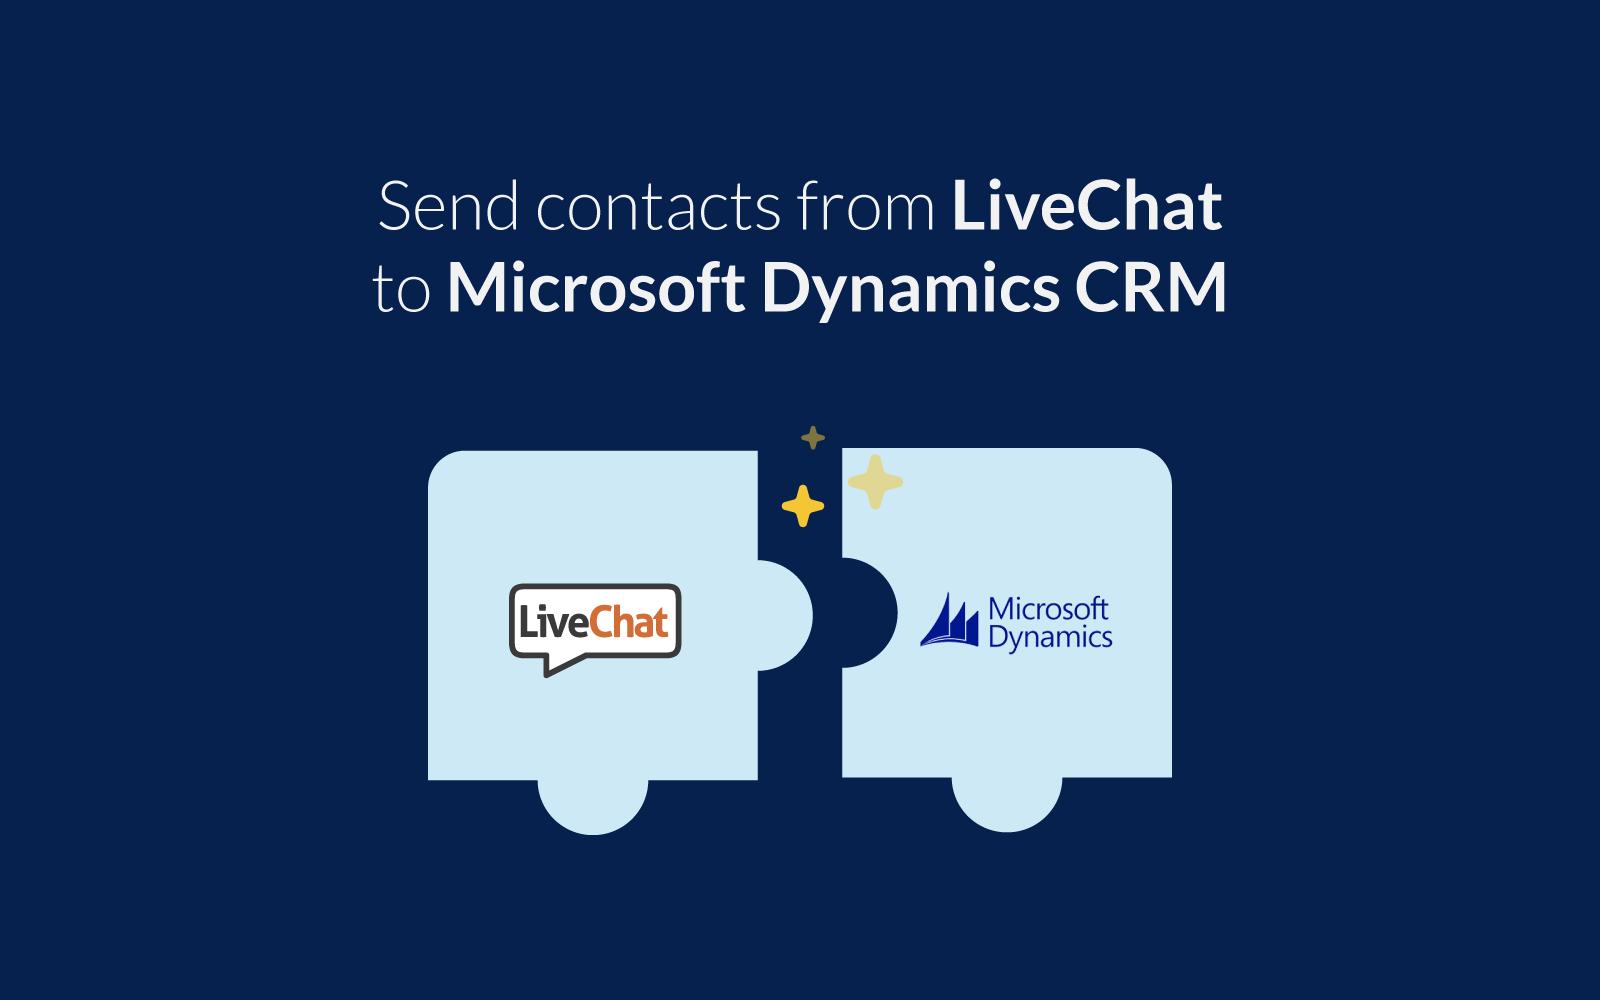 Microsoft Dynamics integration